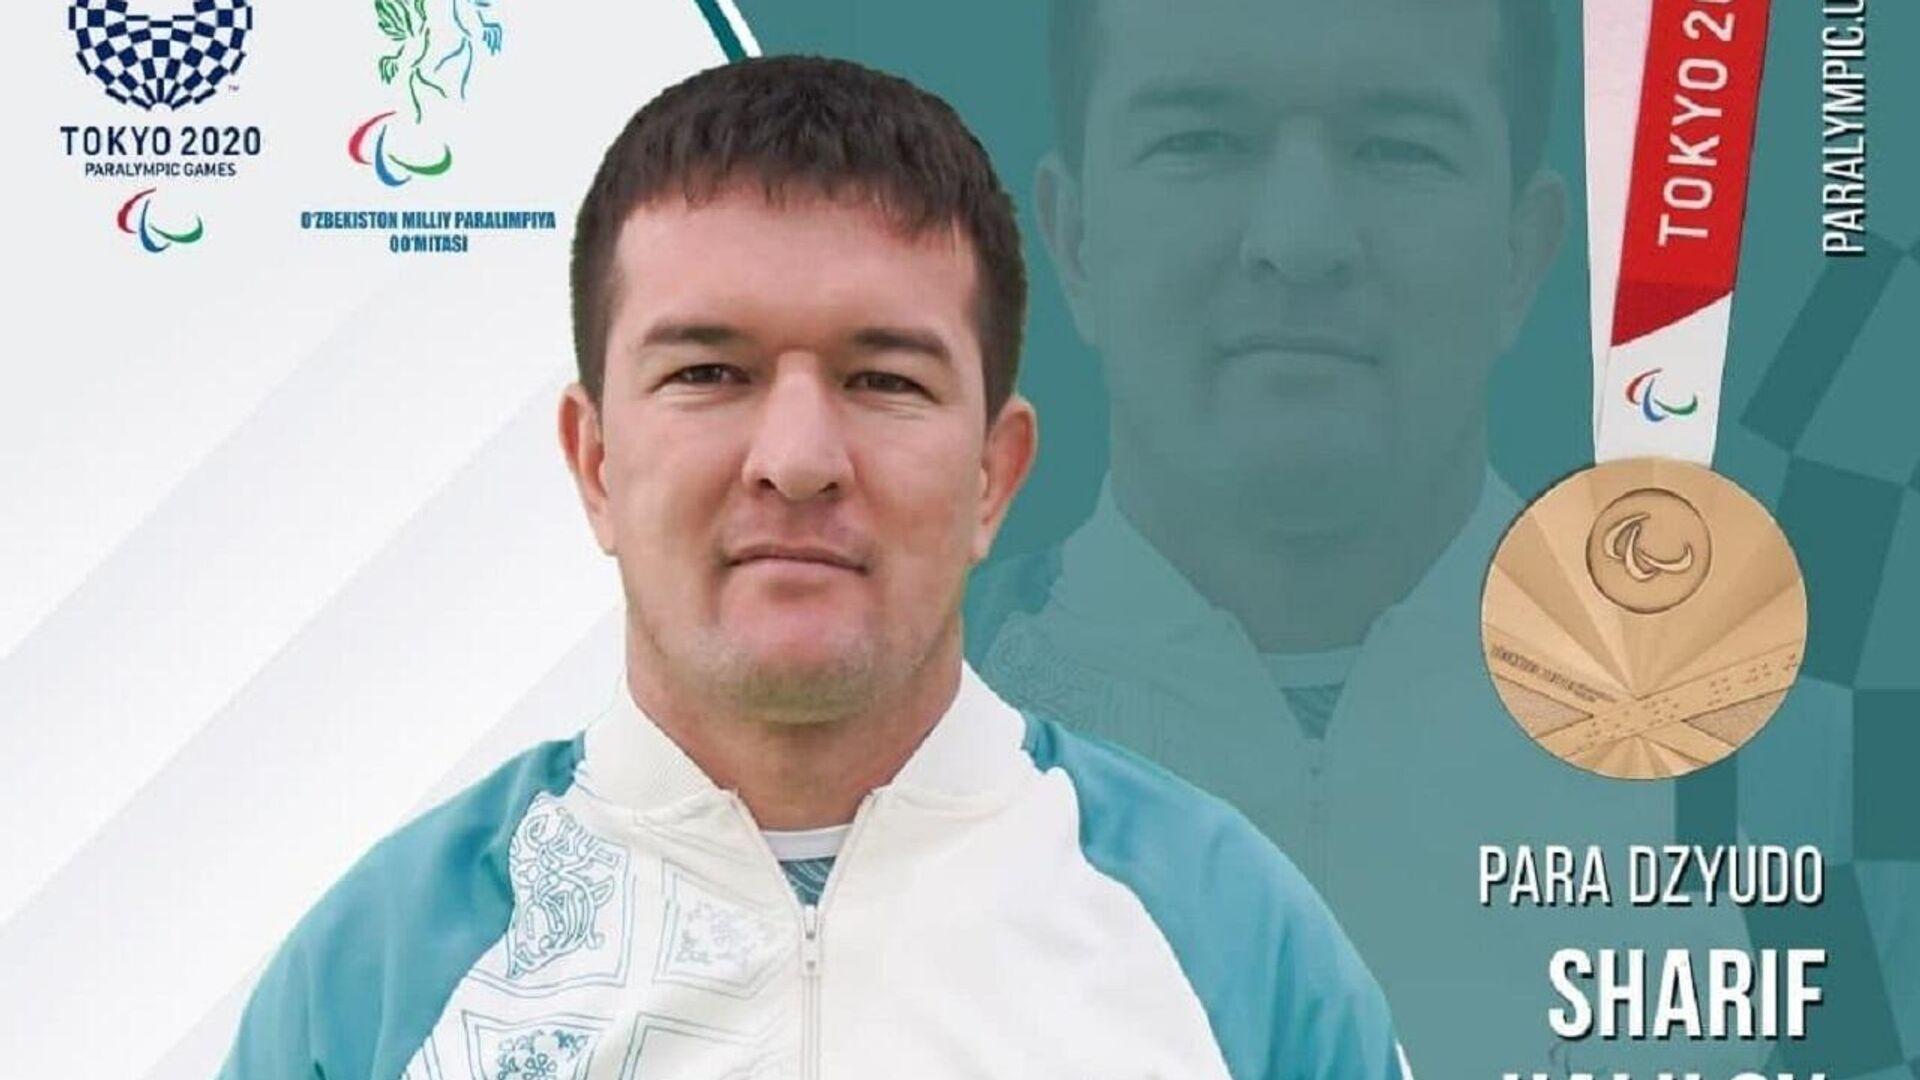 Парадзюдоист Шариф Халилов стал бронзовым призёром. - Sputnik Узбекистан, 1920, 29.08.2021